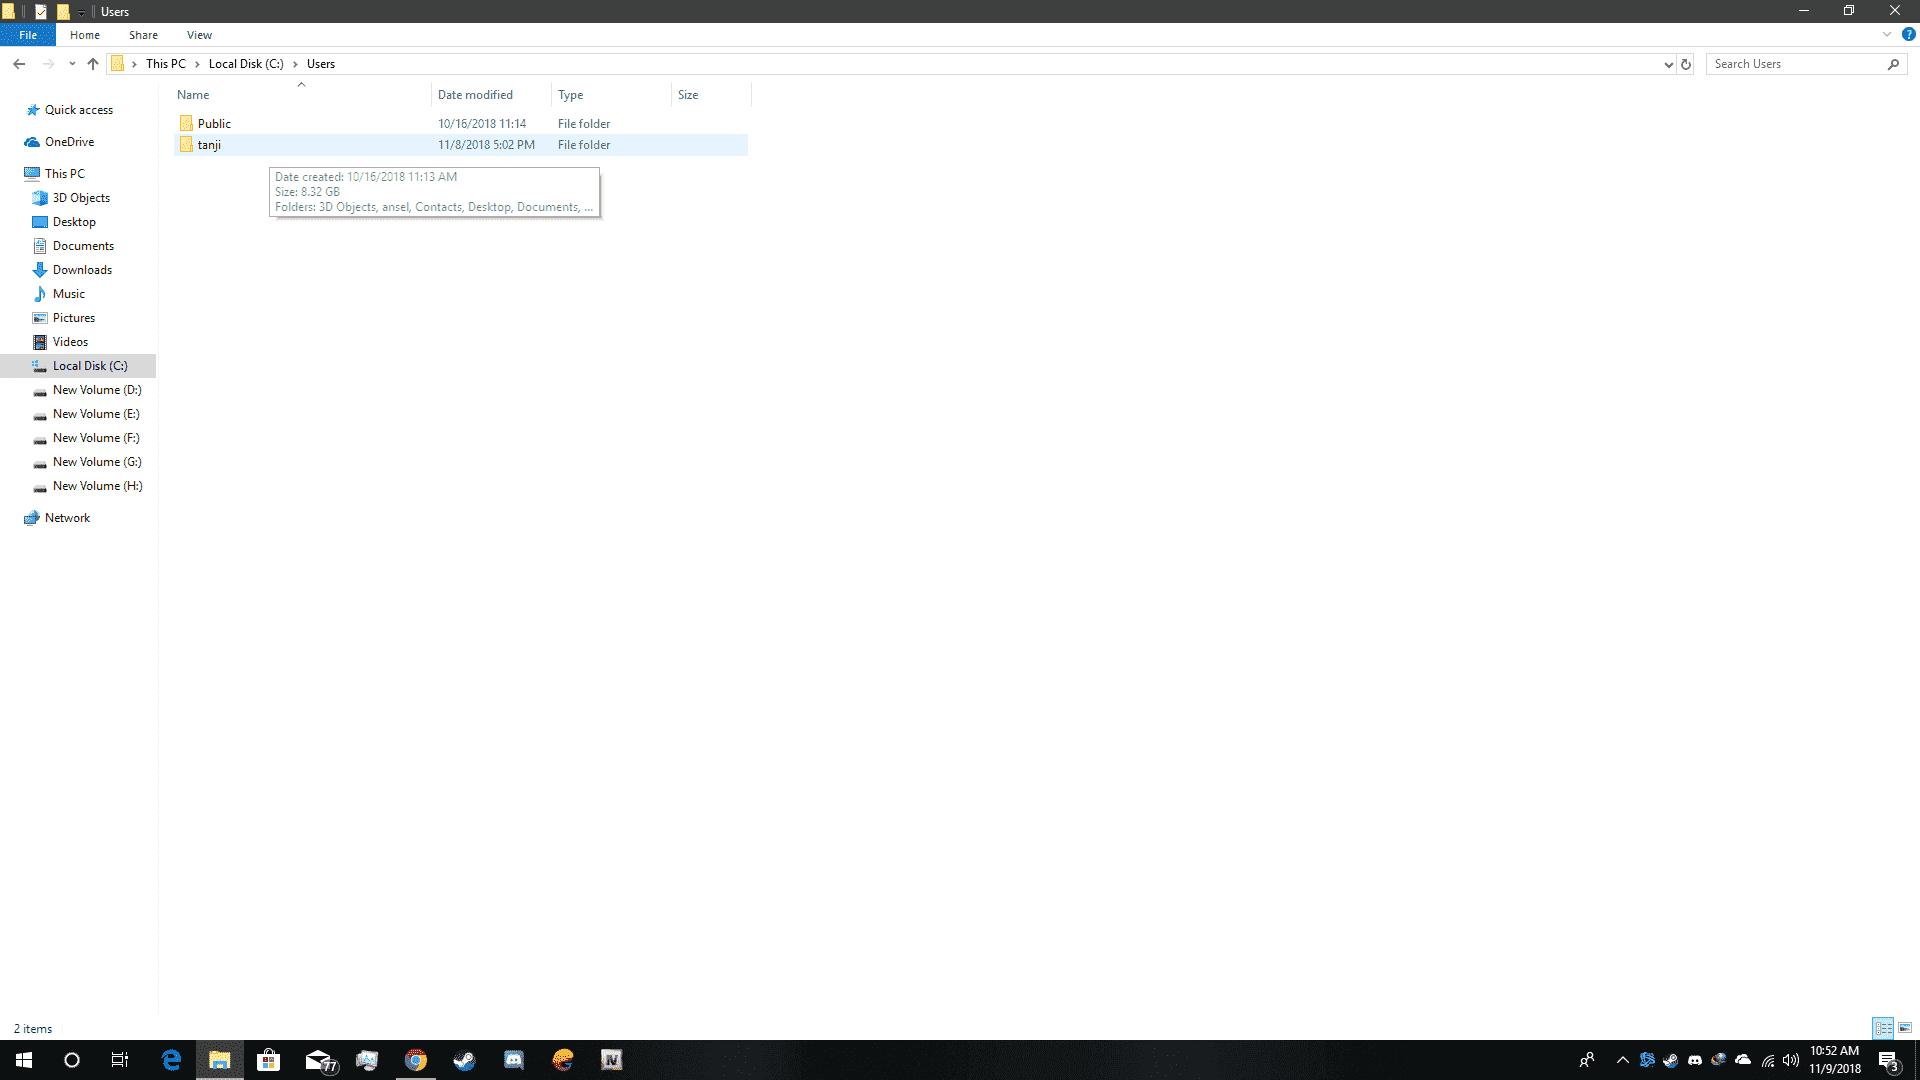 Windows 10 Username last character is not showing 6af5e42c-1f07-4ca0-b163-fb7025b086cb?upload=true.png